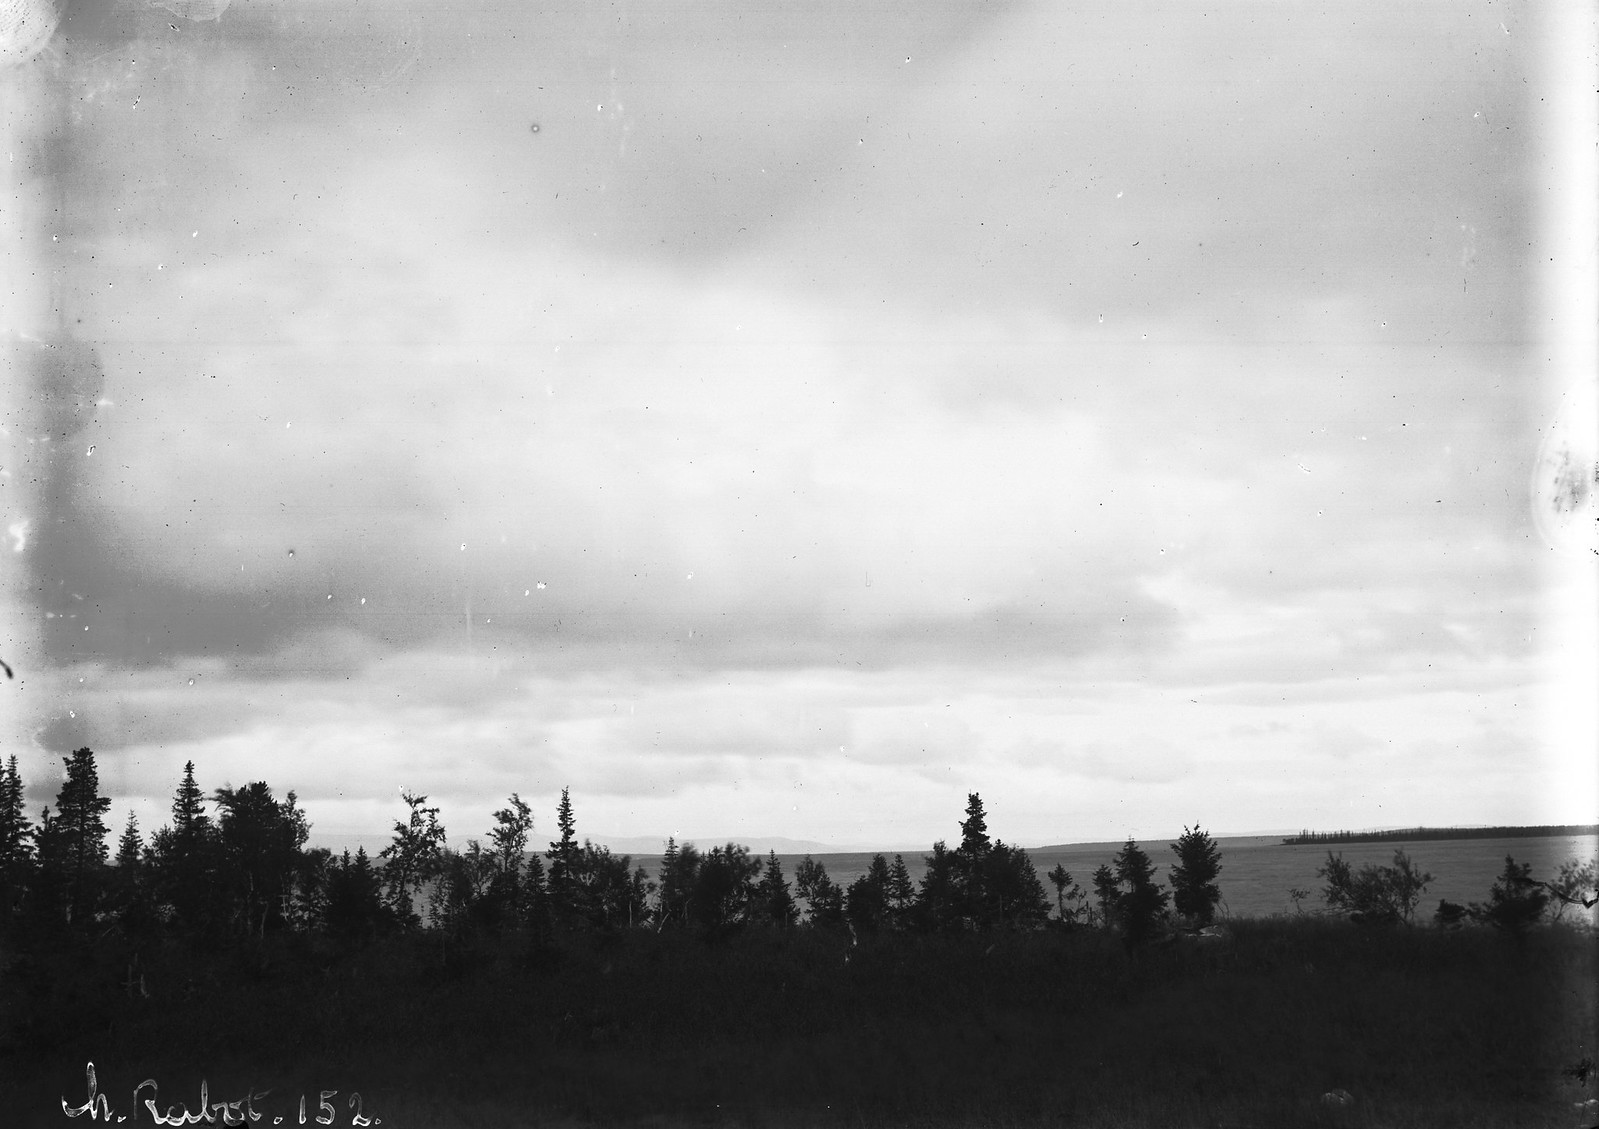 1884. Йокостровская Имандра